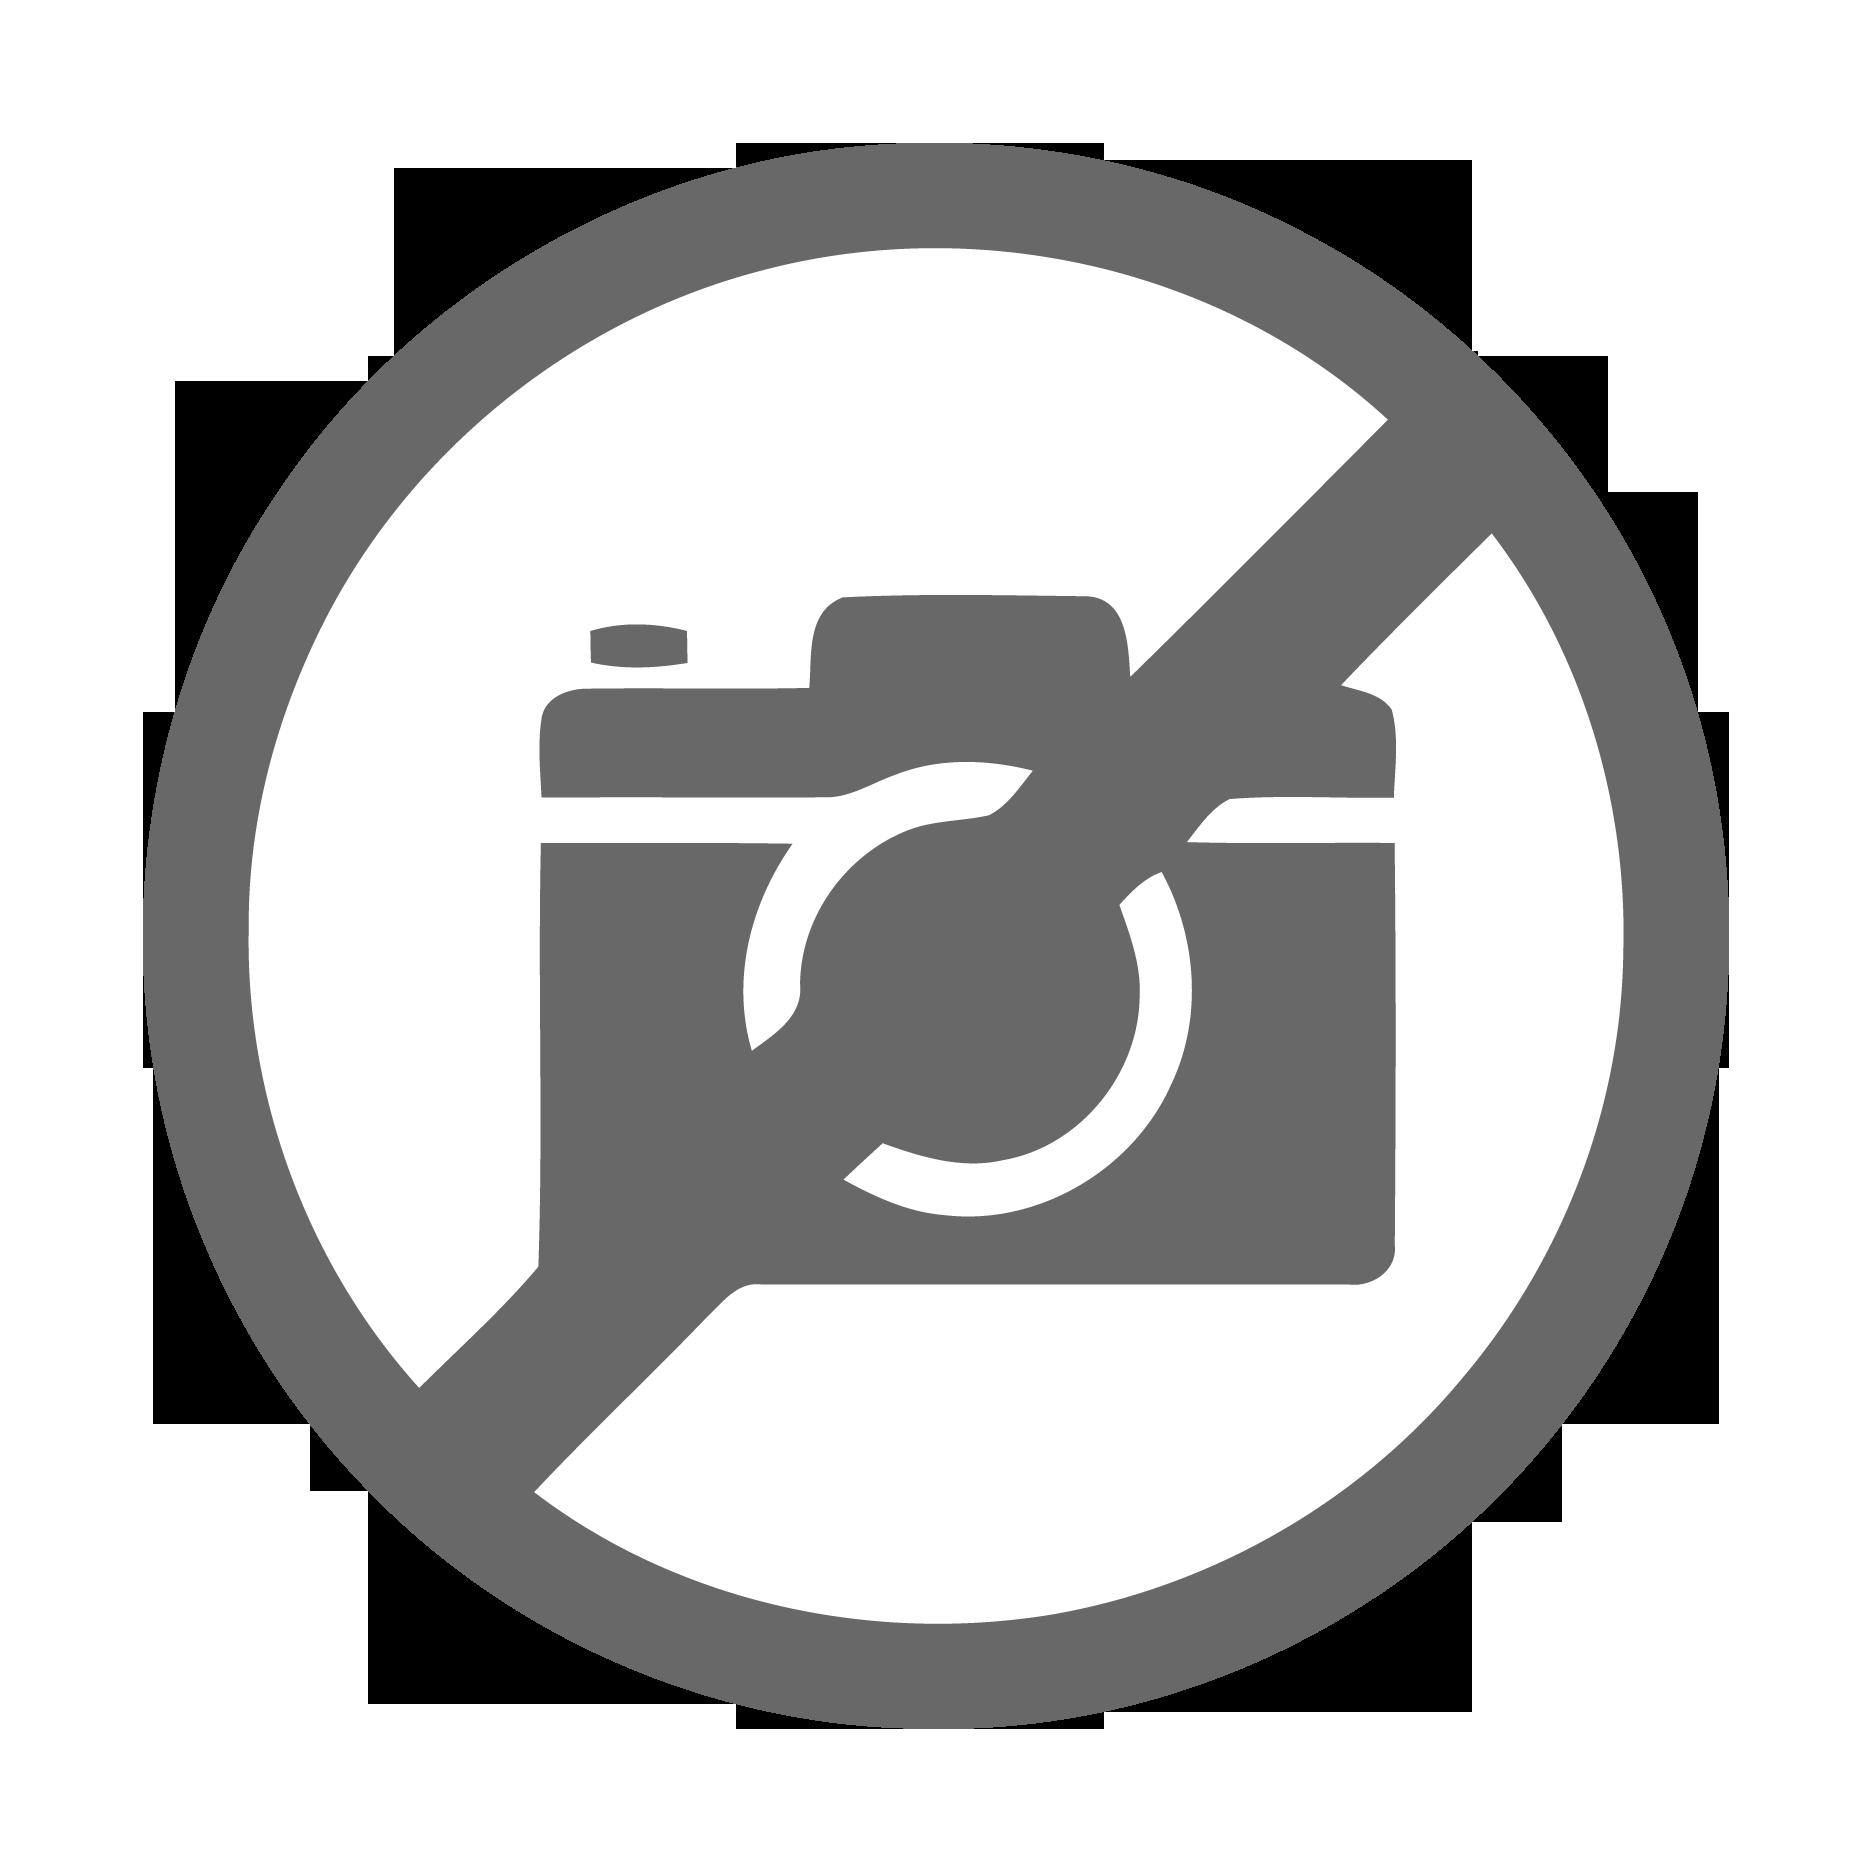 Godzila Catering